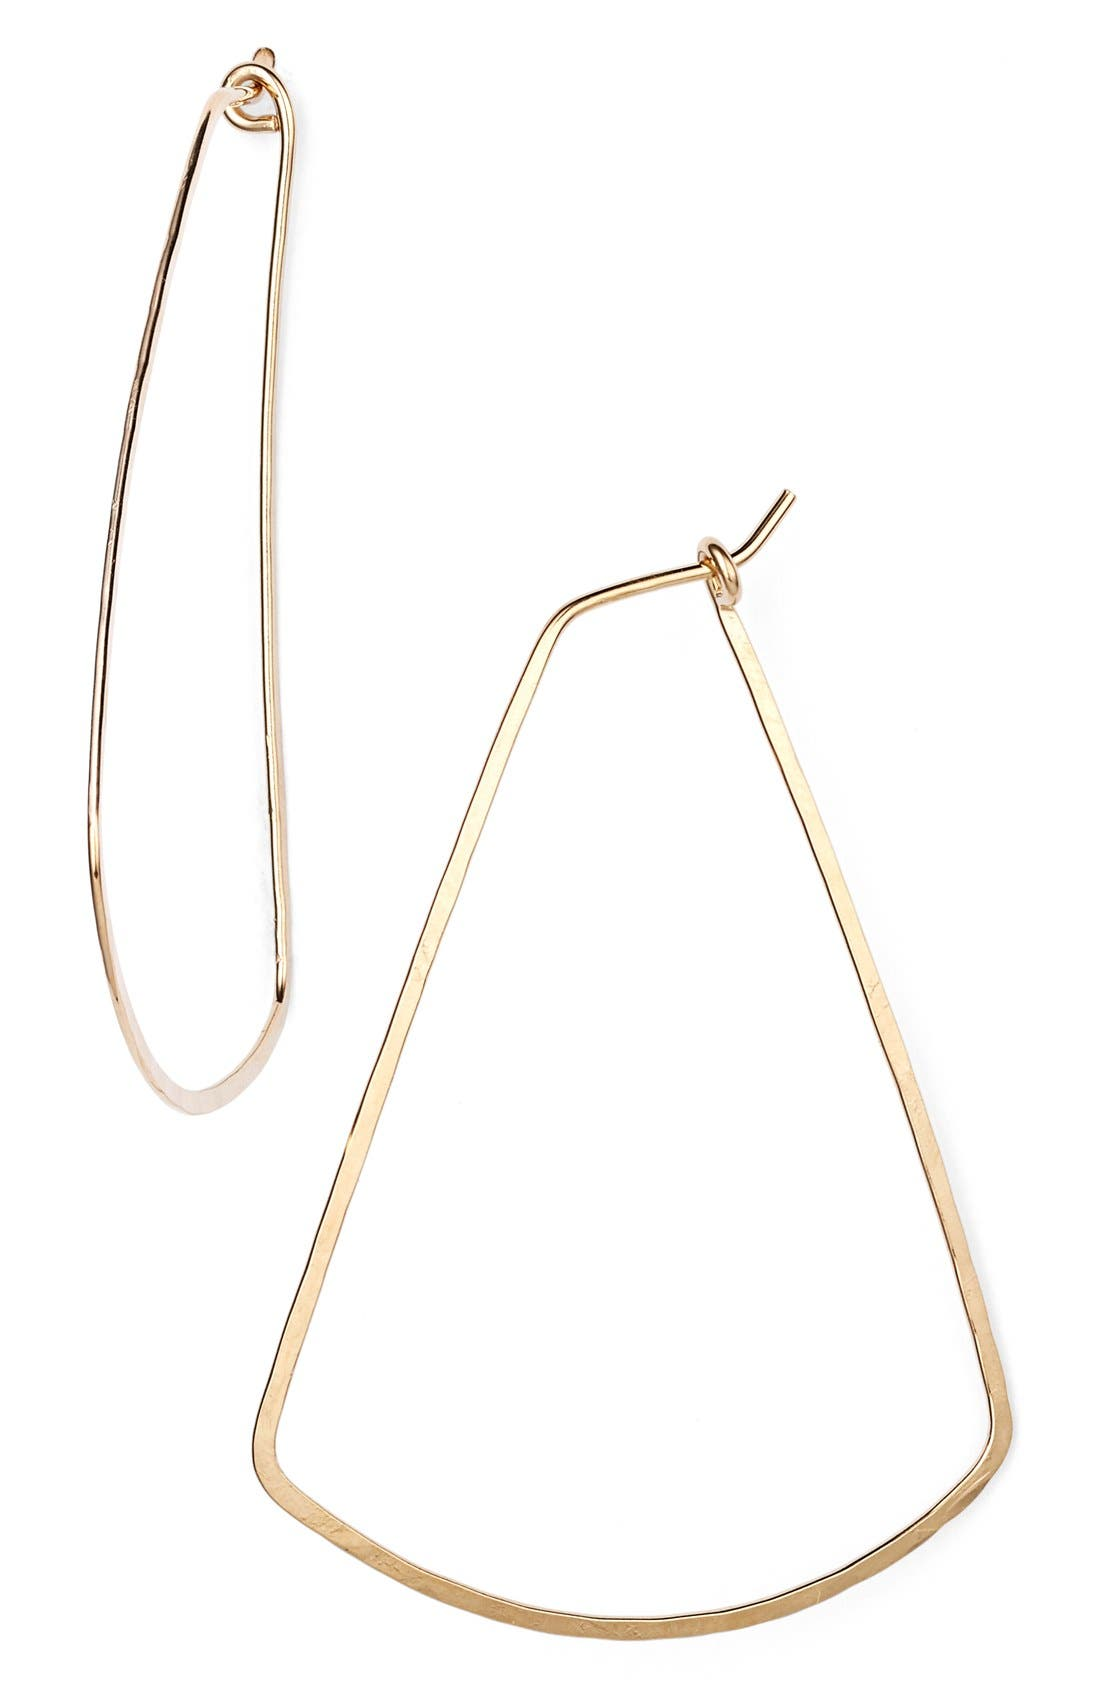 Main Image - Nashelle Ija Triangle Hoop Earrings